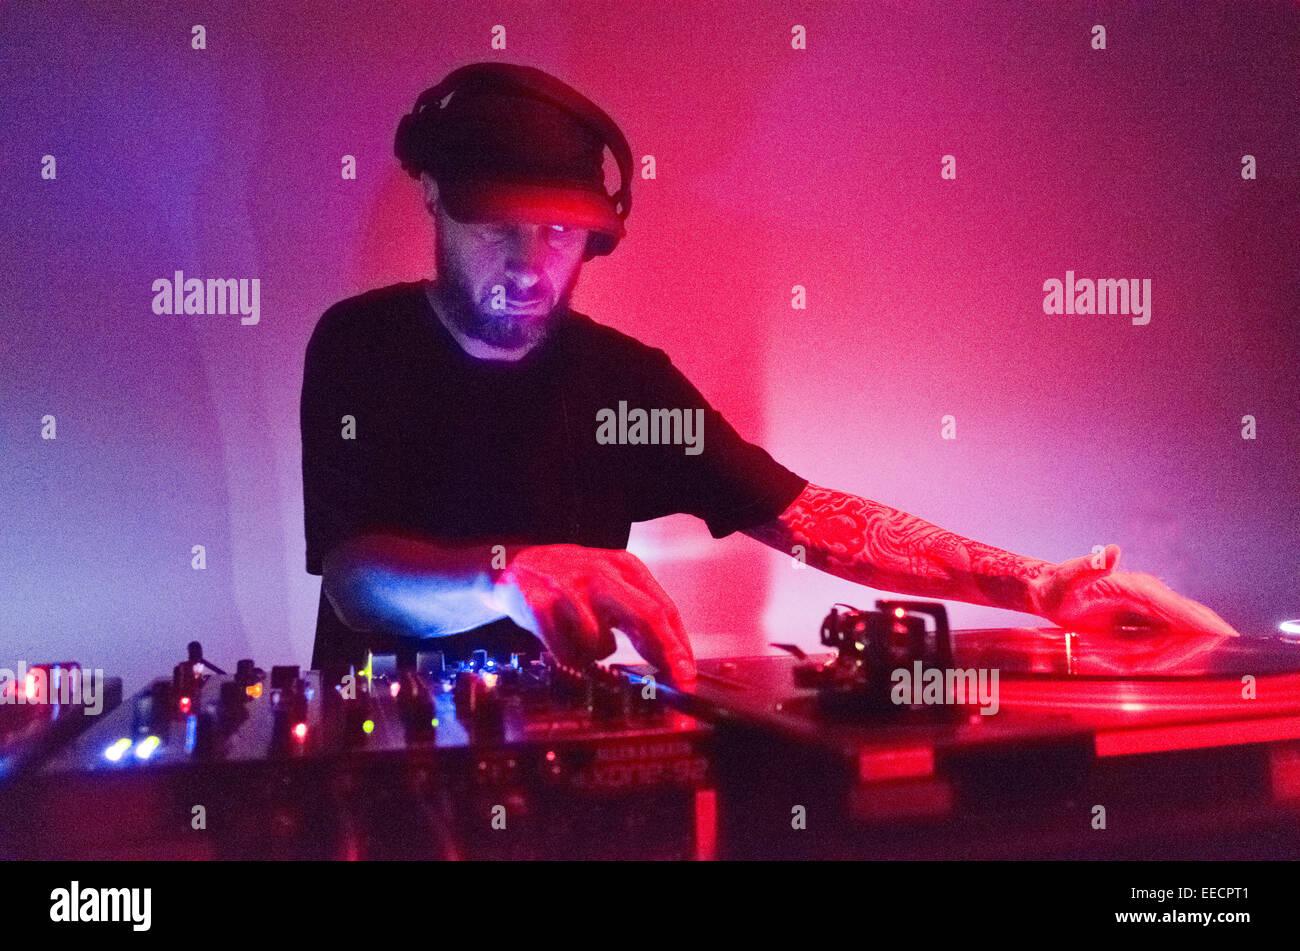 Levon Vincent DJing live - Stock Image